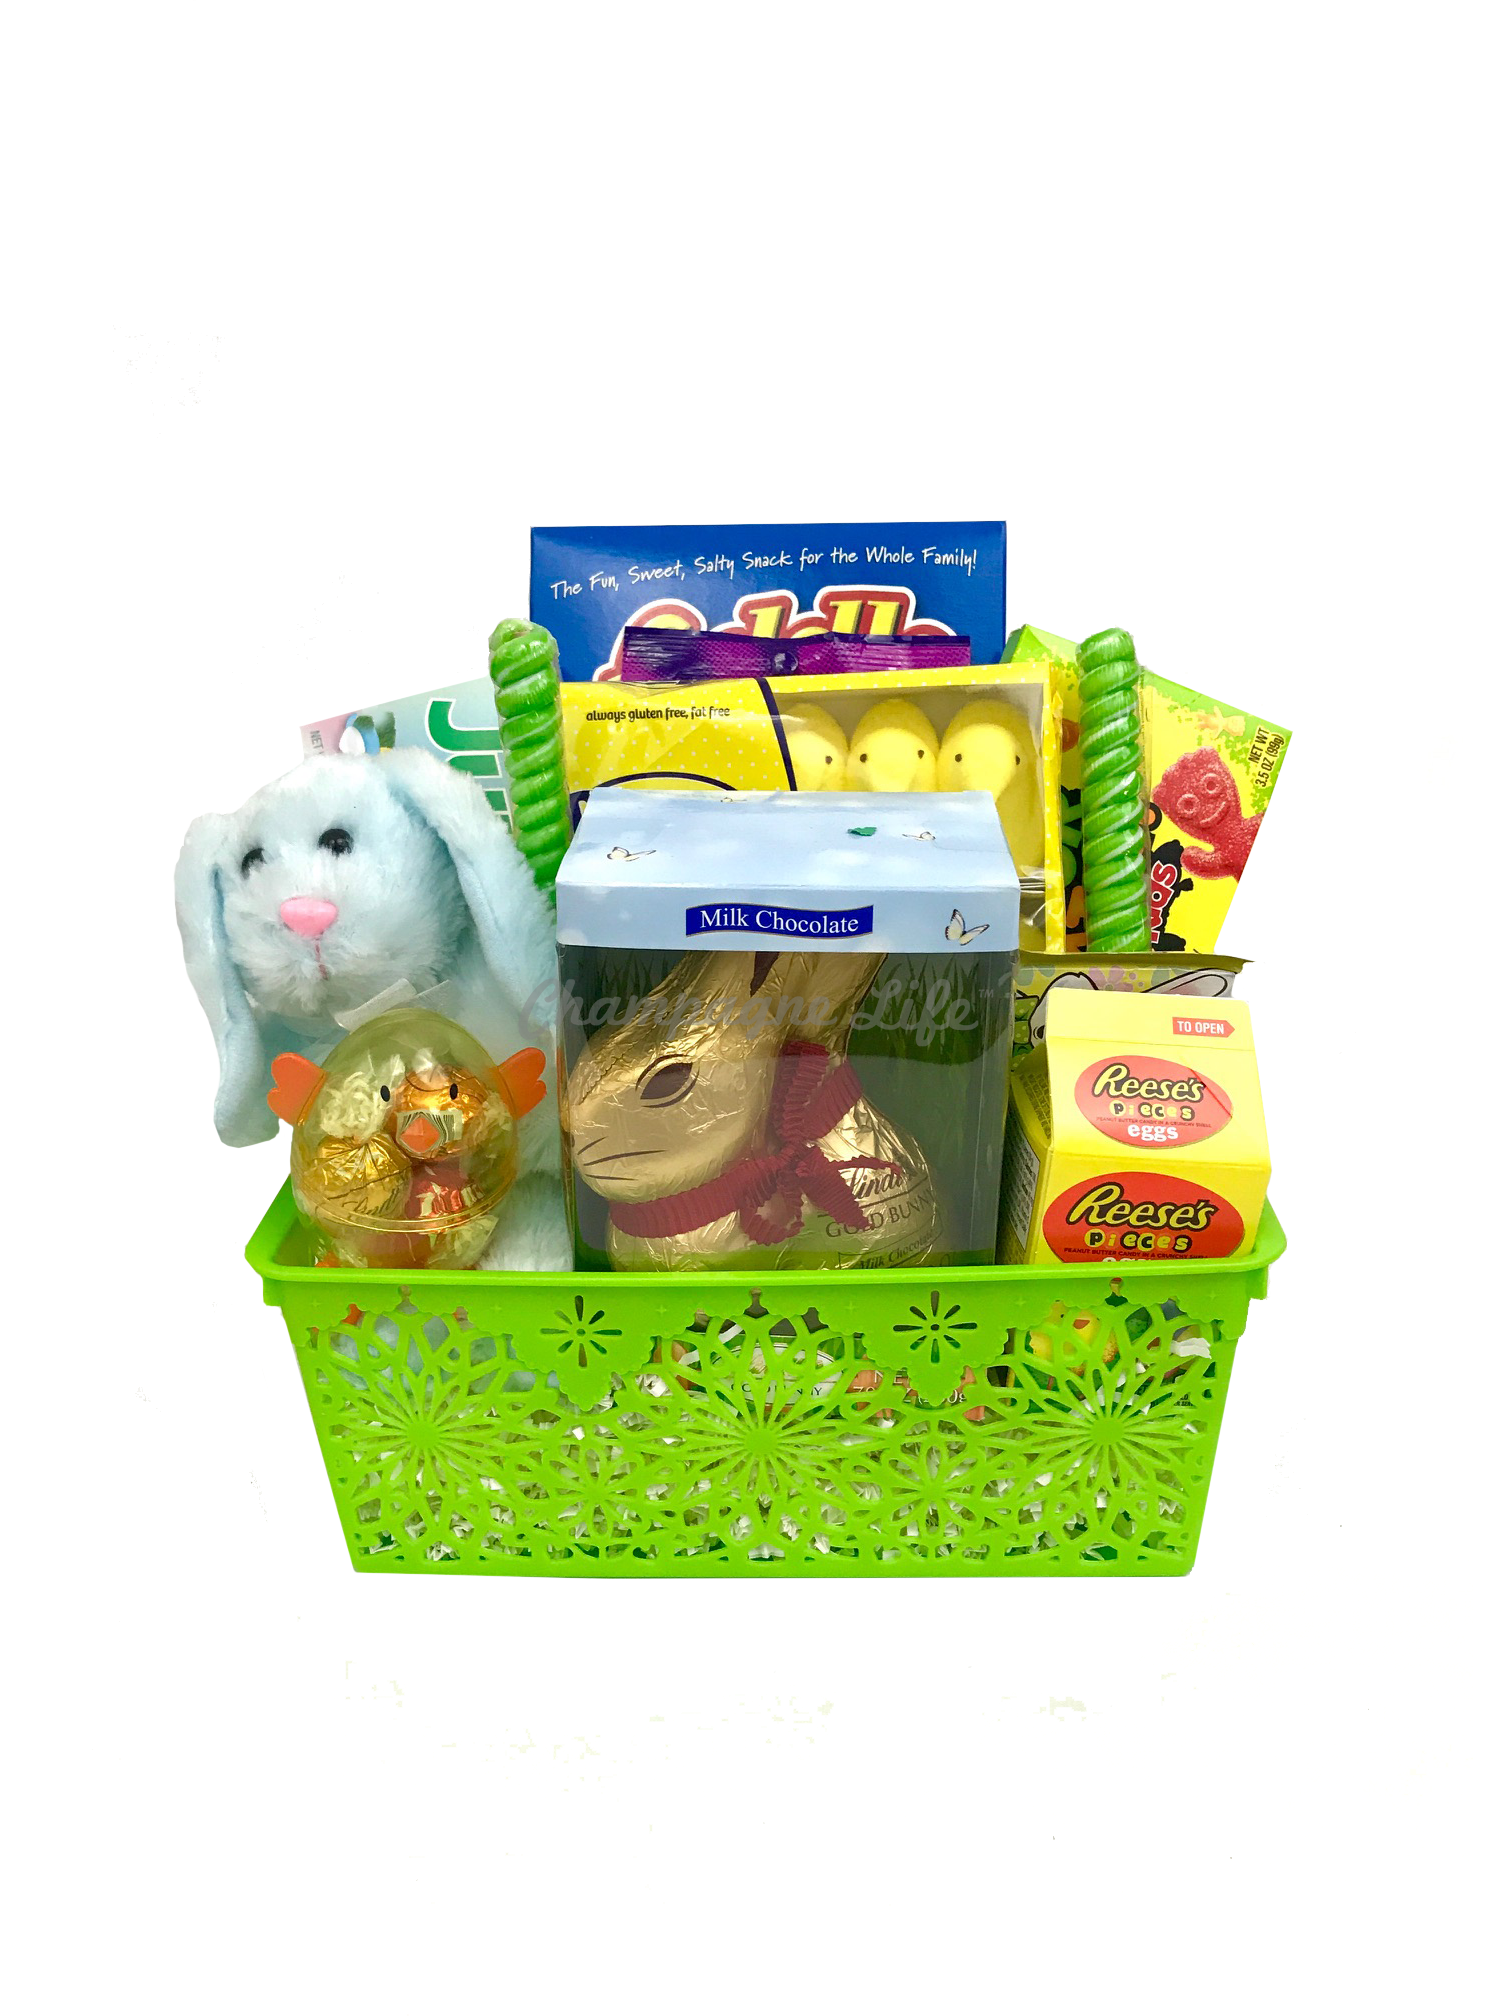 sc 1 st  Ch&agne Life Gift Baskets & Boyu0027s Green Easter Gift Basket